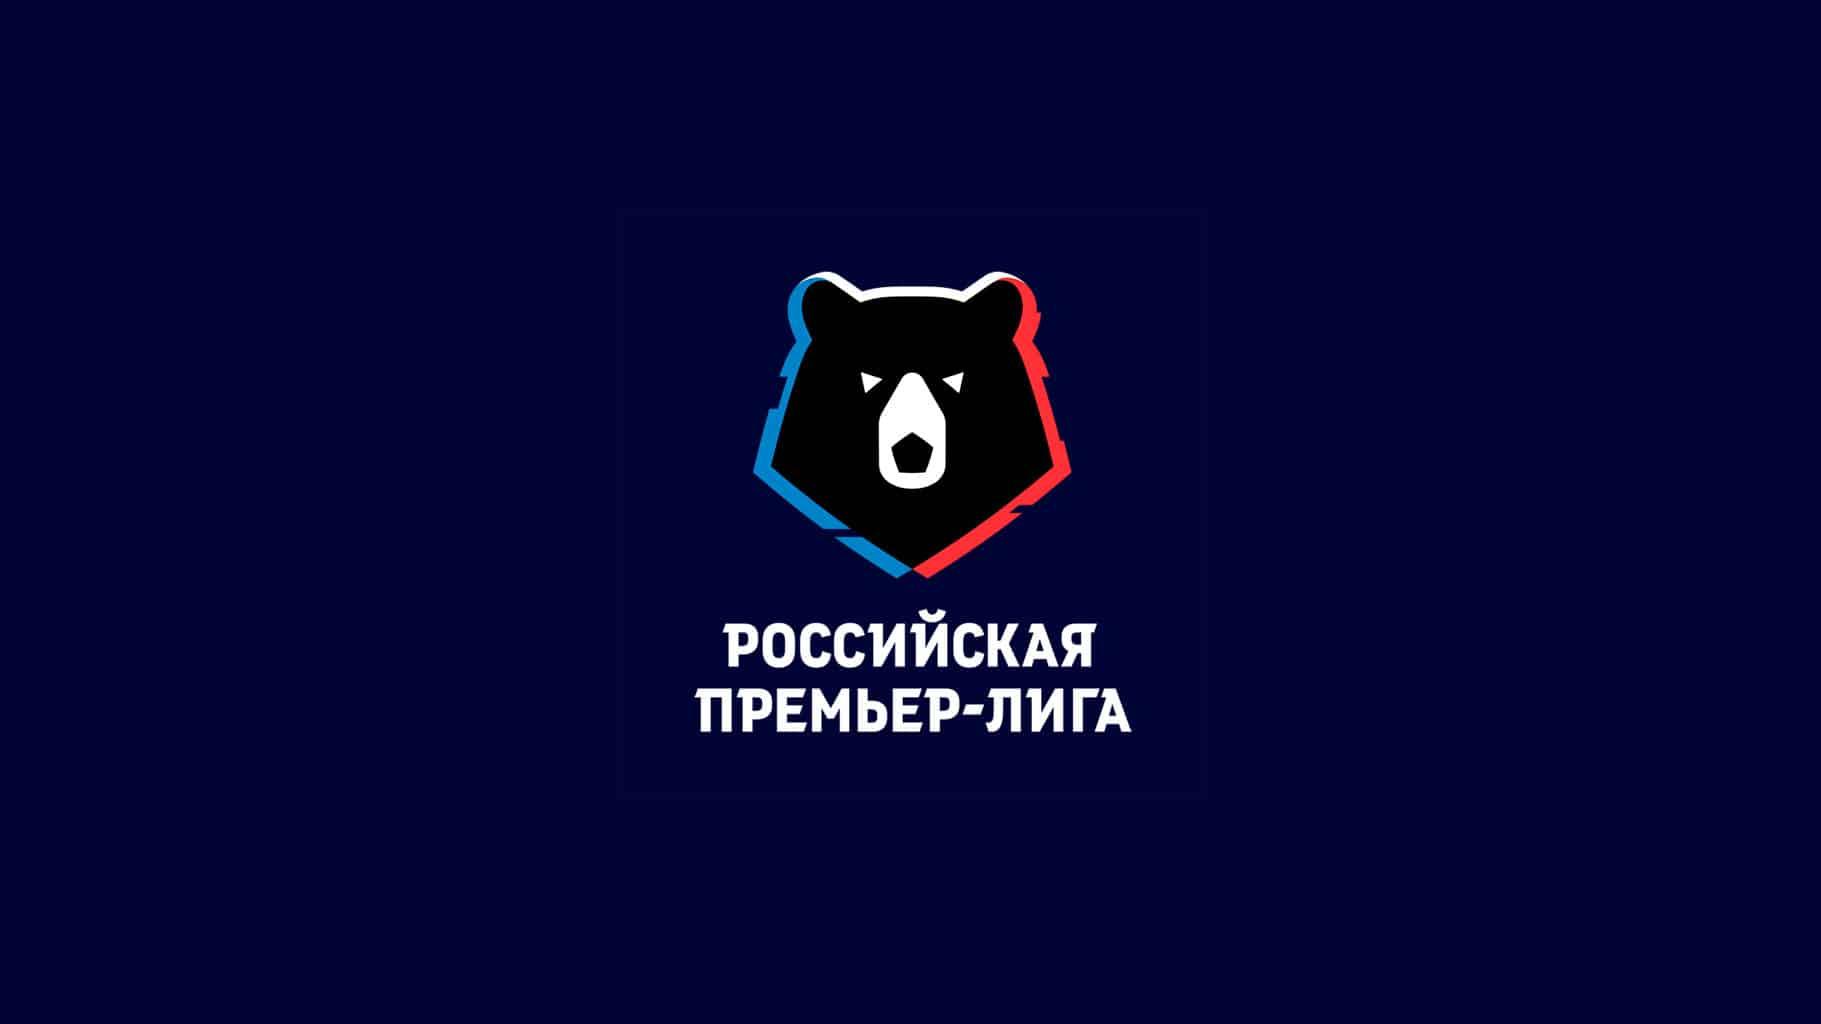 CSKA Moscú – Spartak Moscú